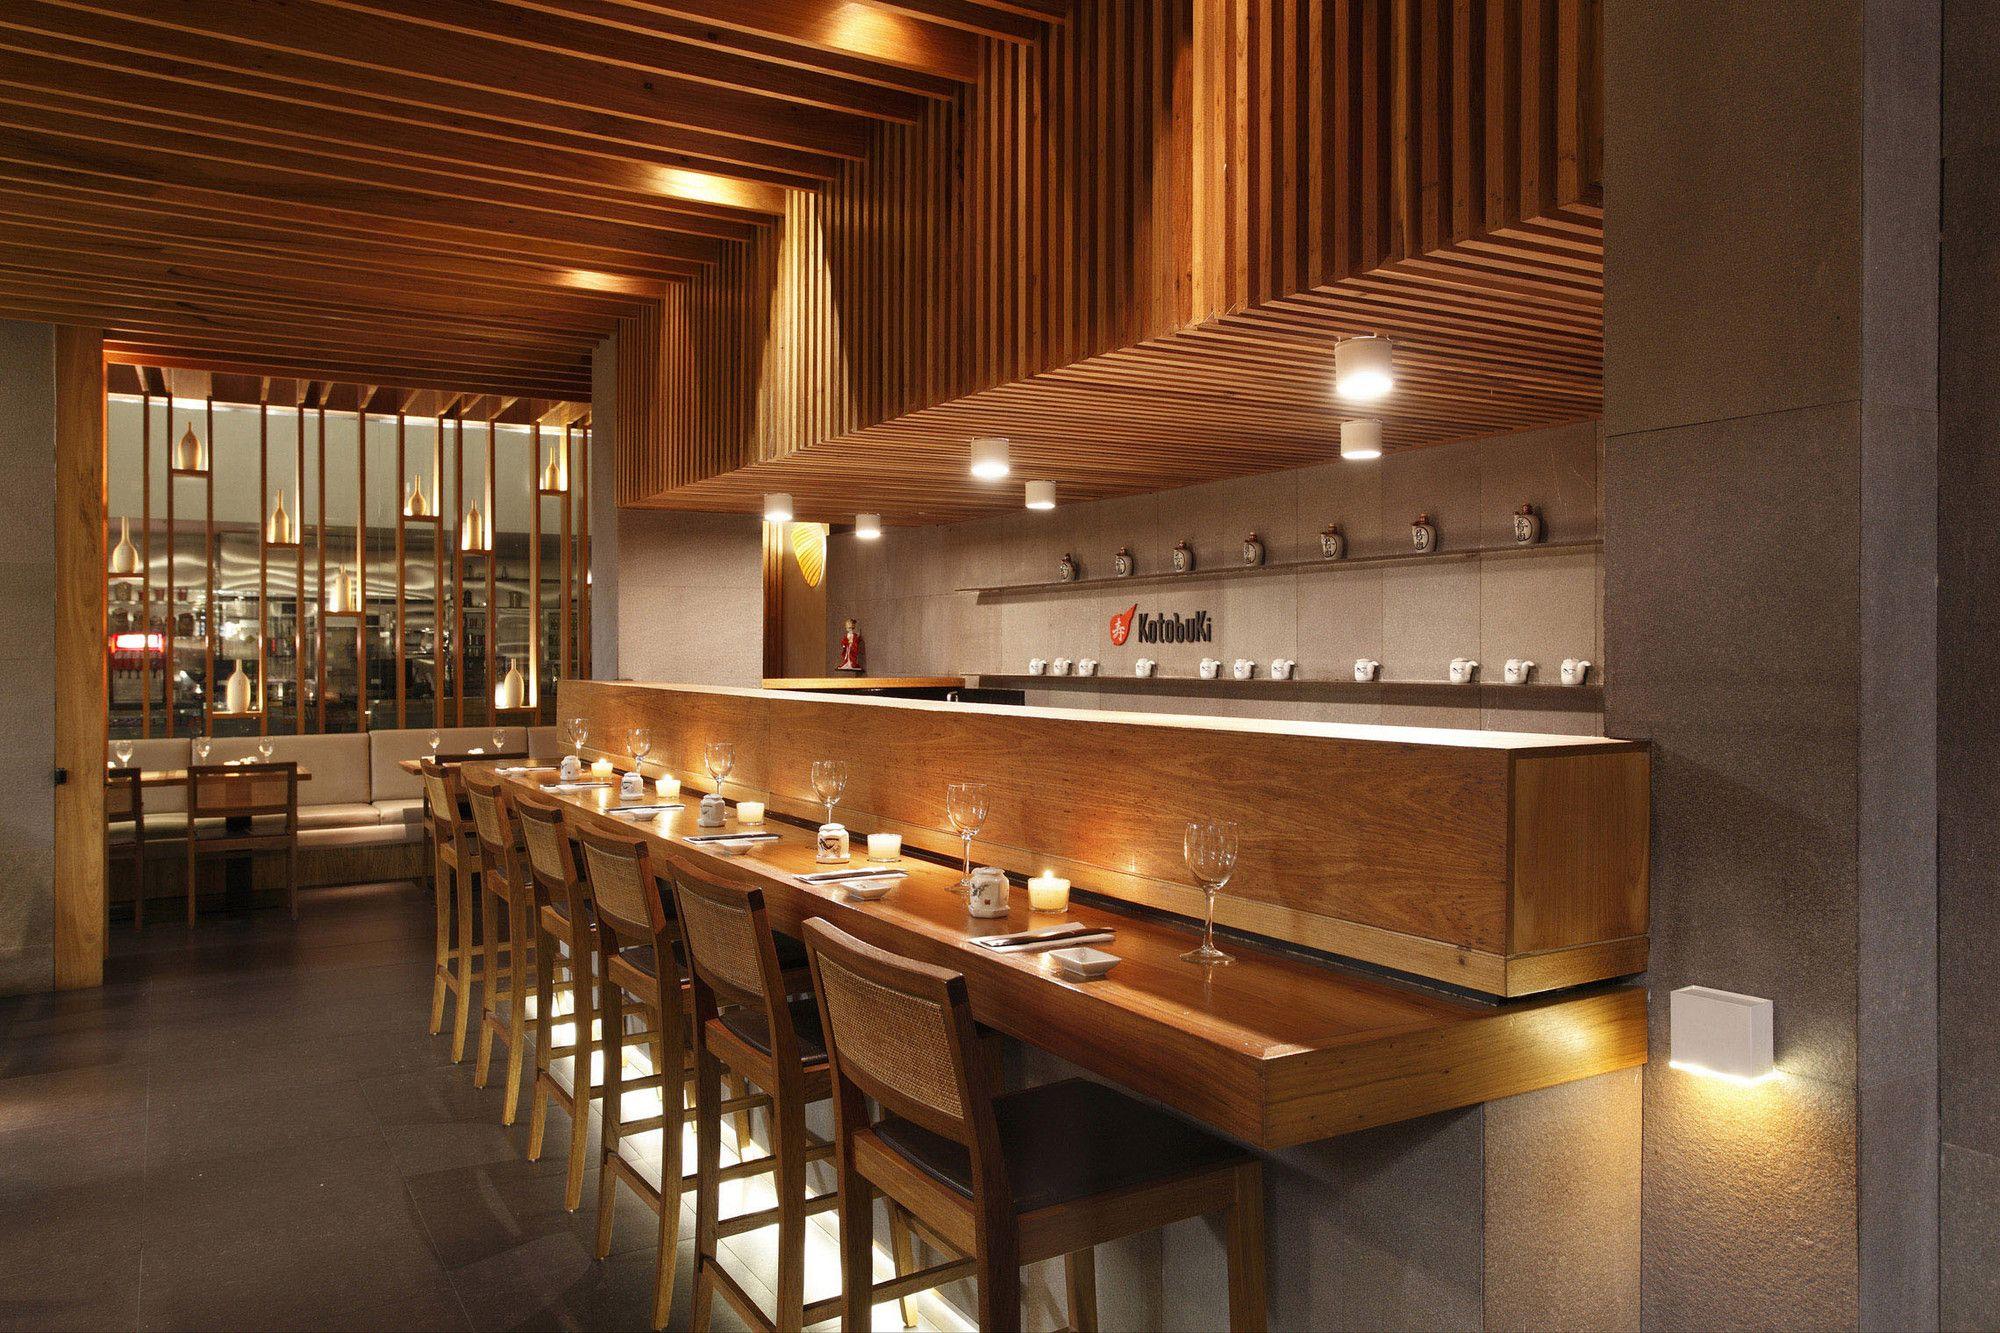 Kotobuki Restaurant / Ivan Rezende Arquitetura | Commercial ...